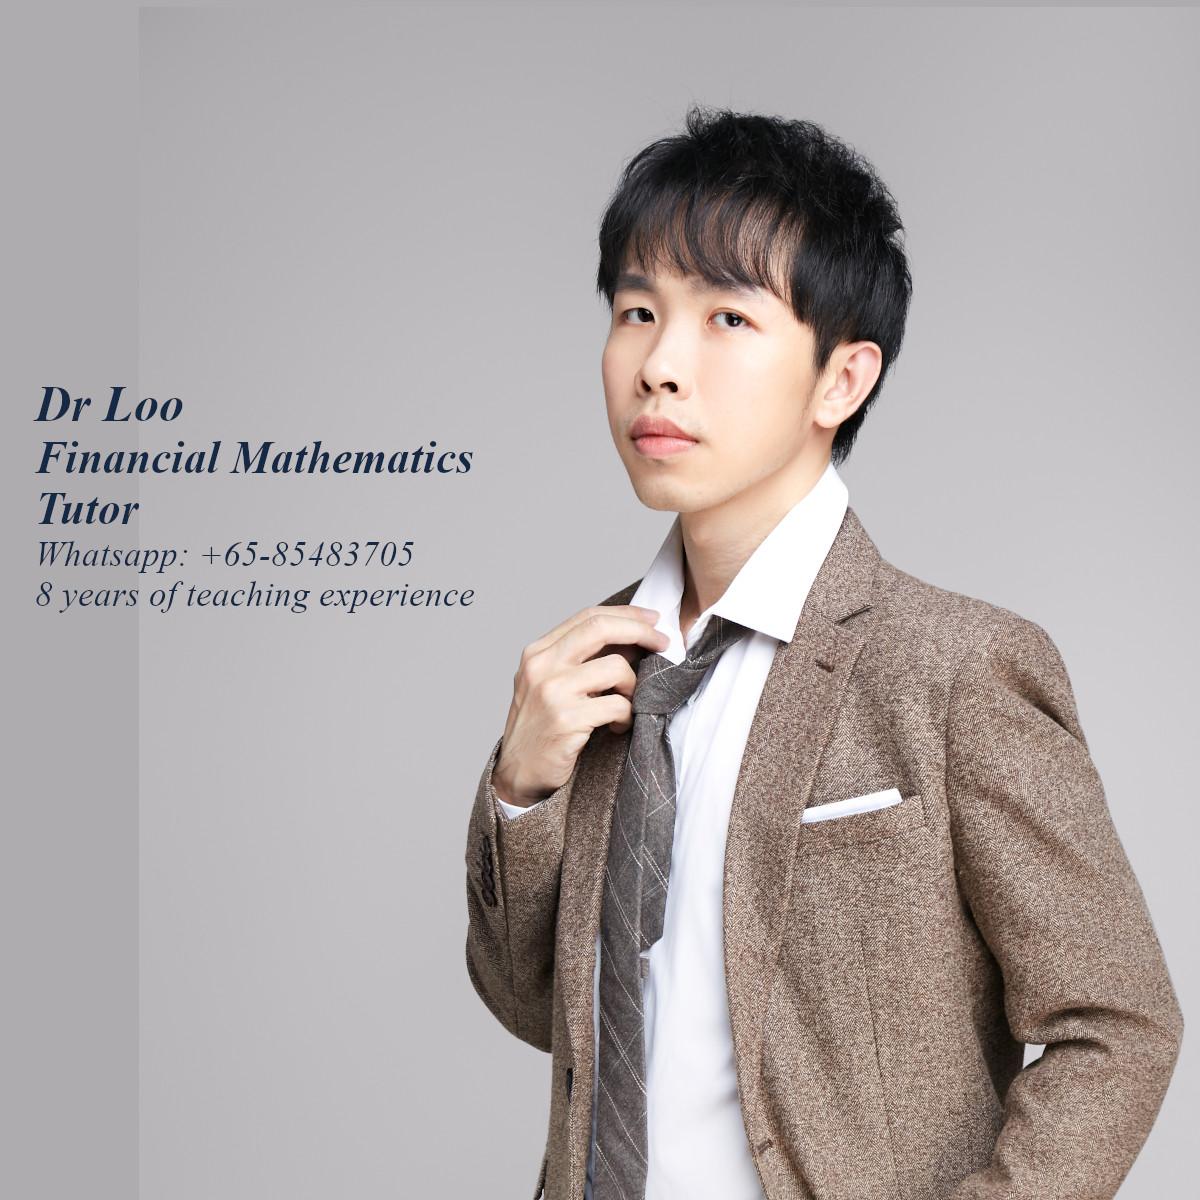 Financial Mathematics Tutor in Singapore